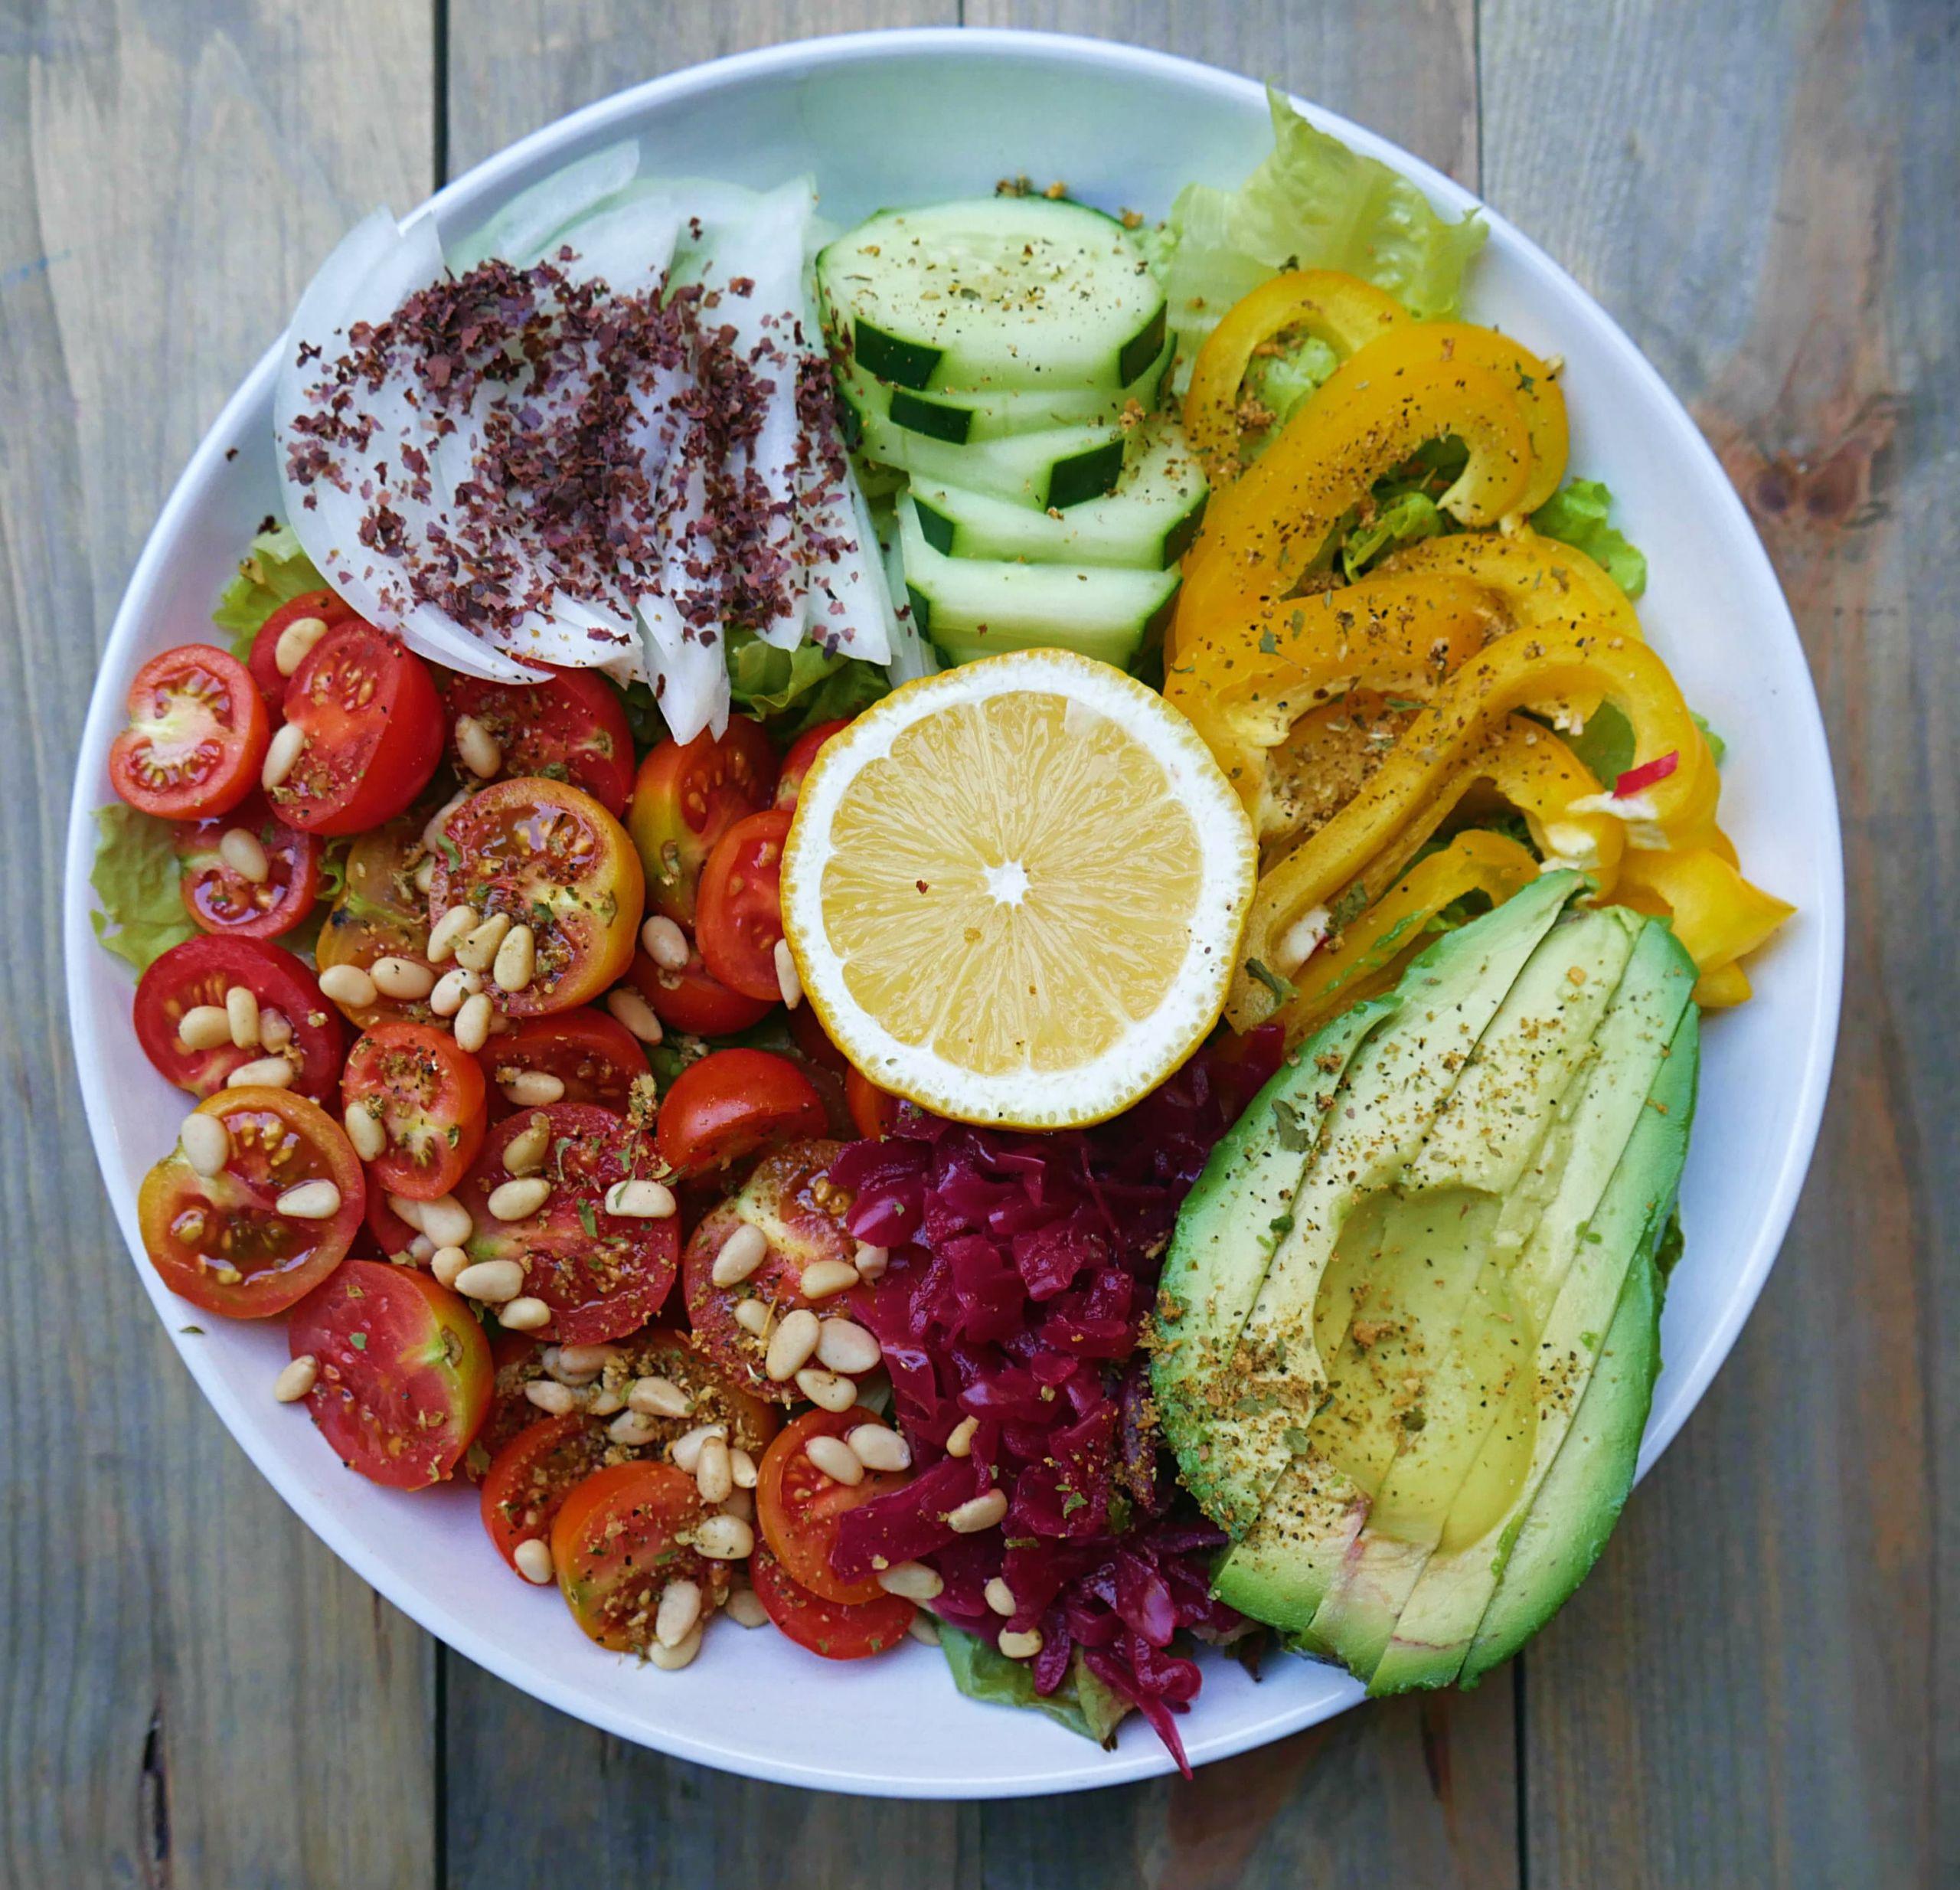 Vegan Plan Meal  Deliciously Planty 1 Month Vegan Diet Meal Plan